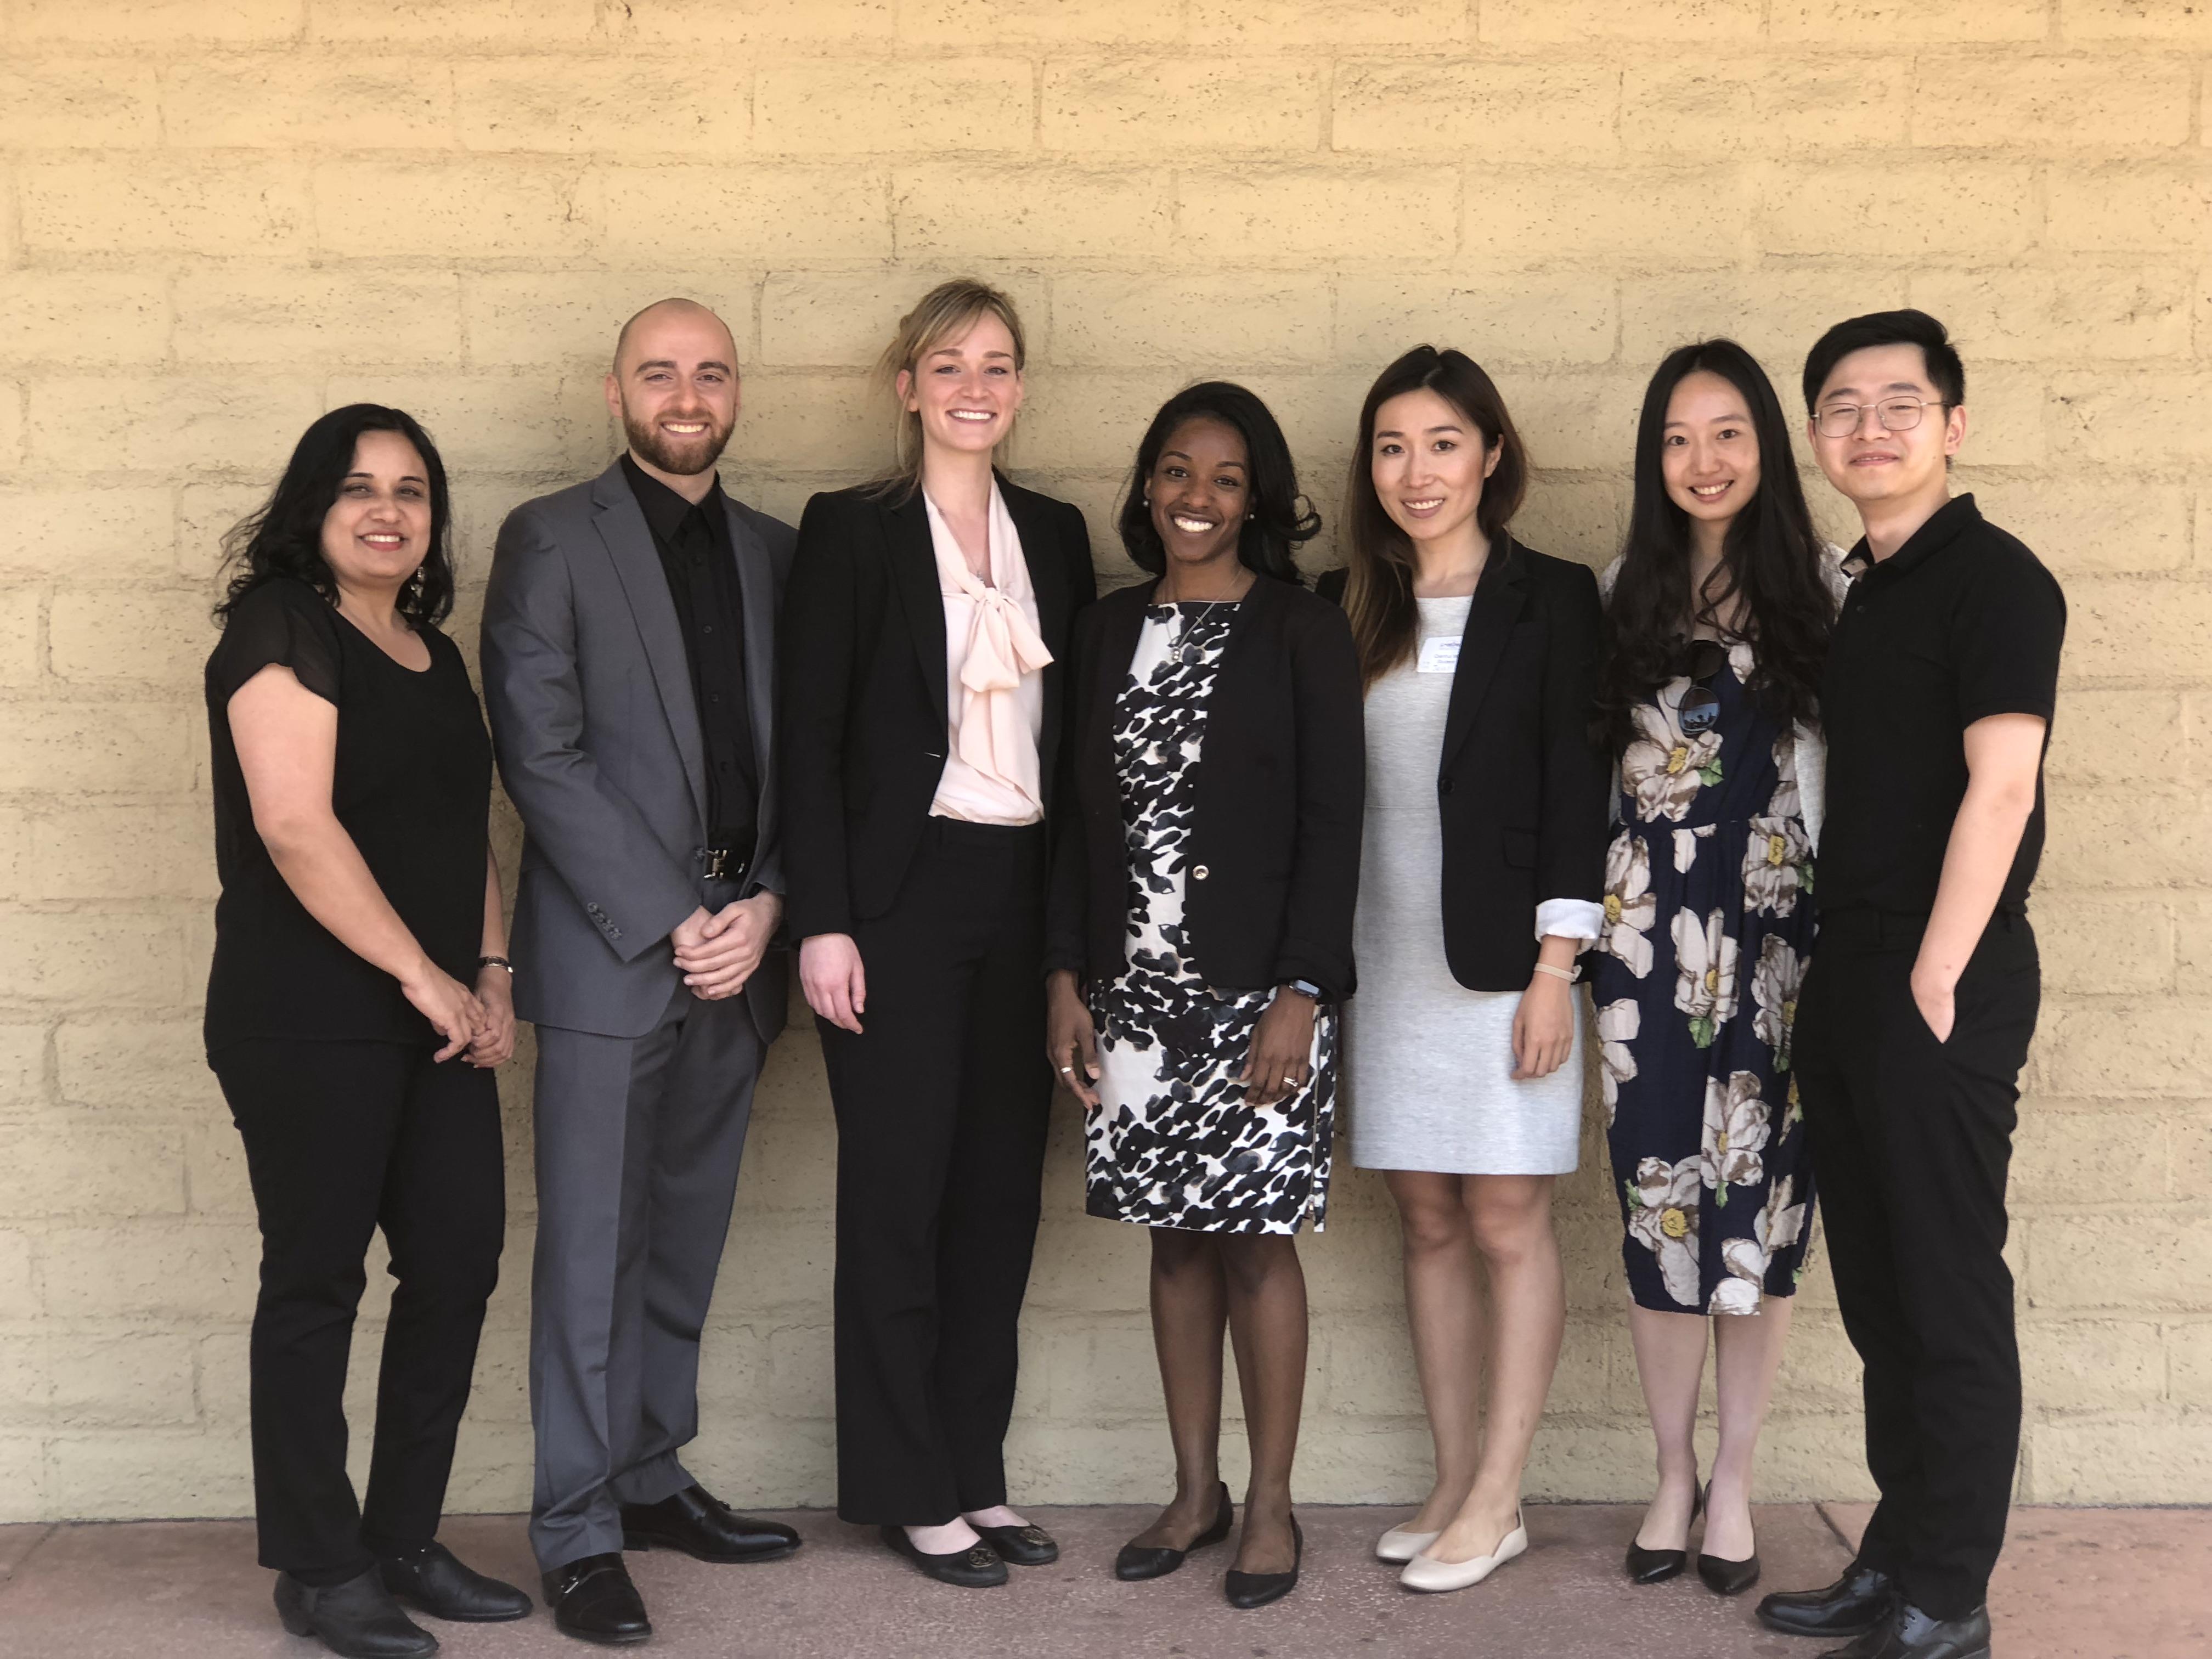 Group Photo - April 2018 - Grodins Symposium, Los Angeles, CA